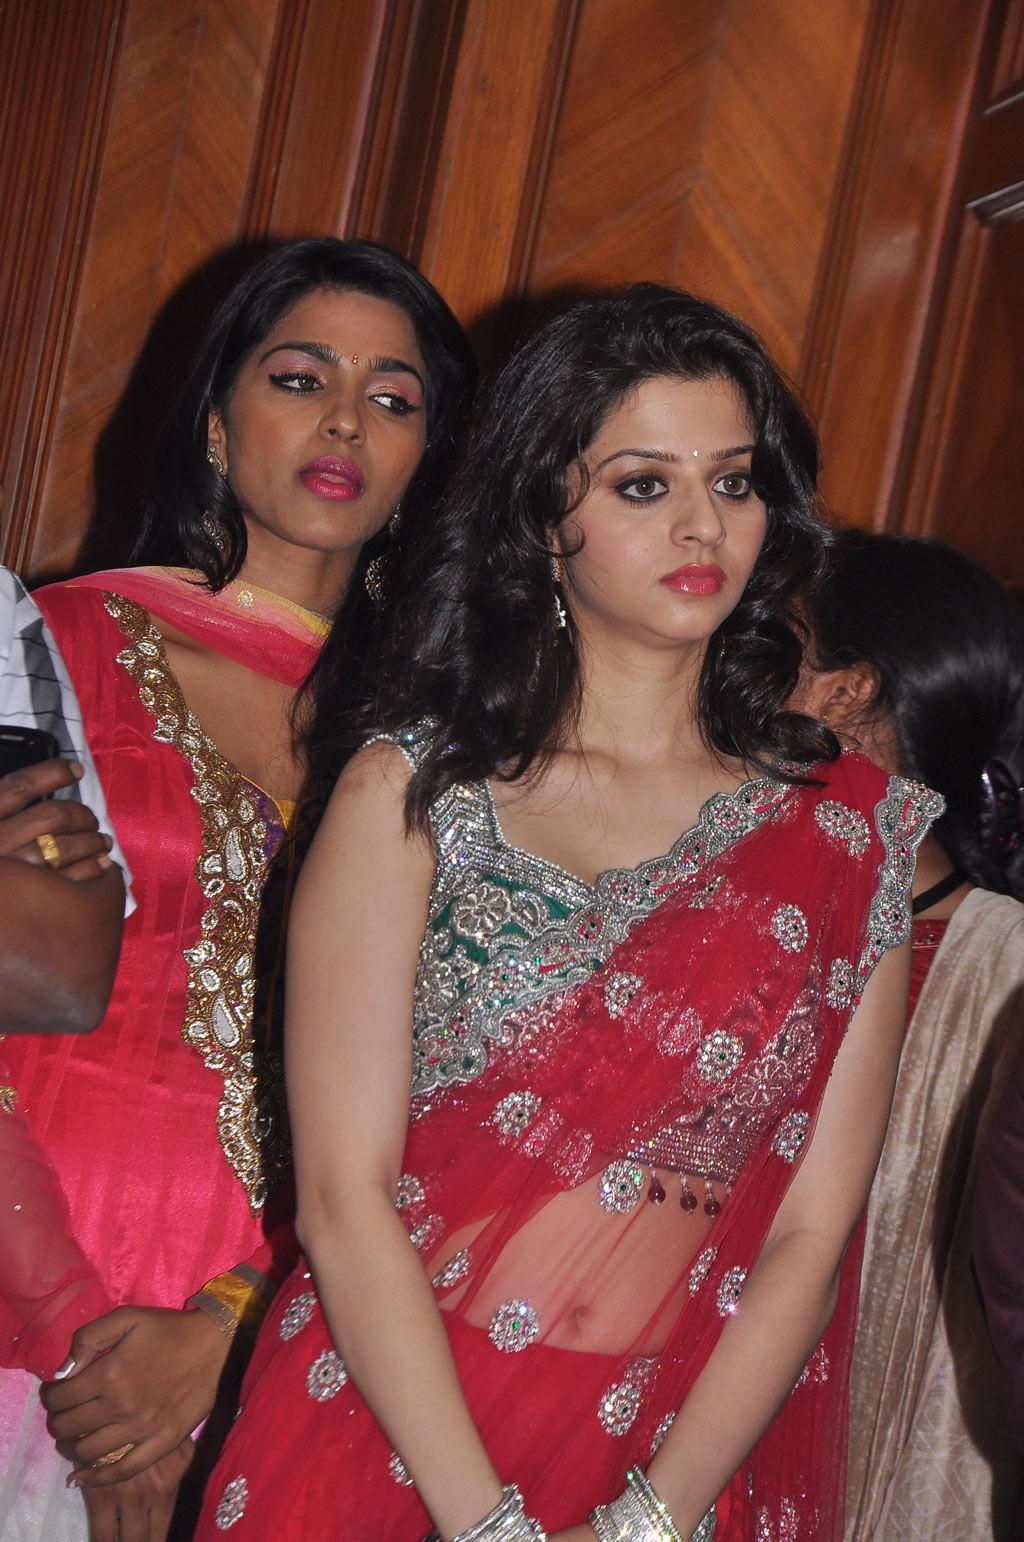 Vedika in red hot saree